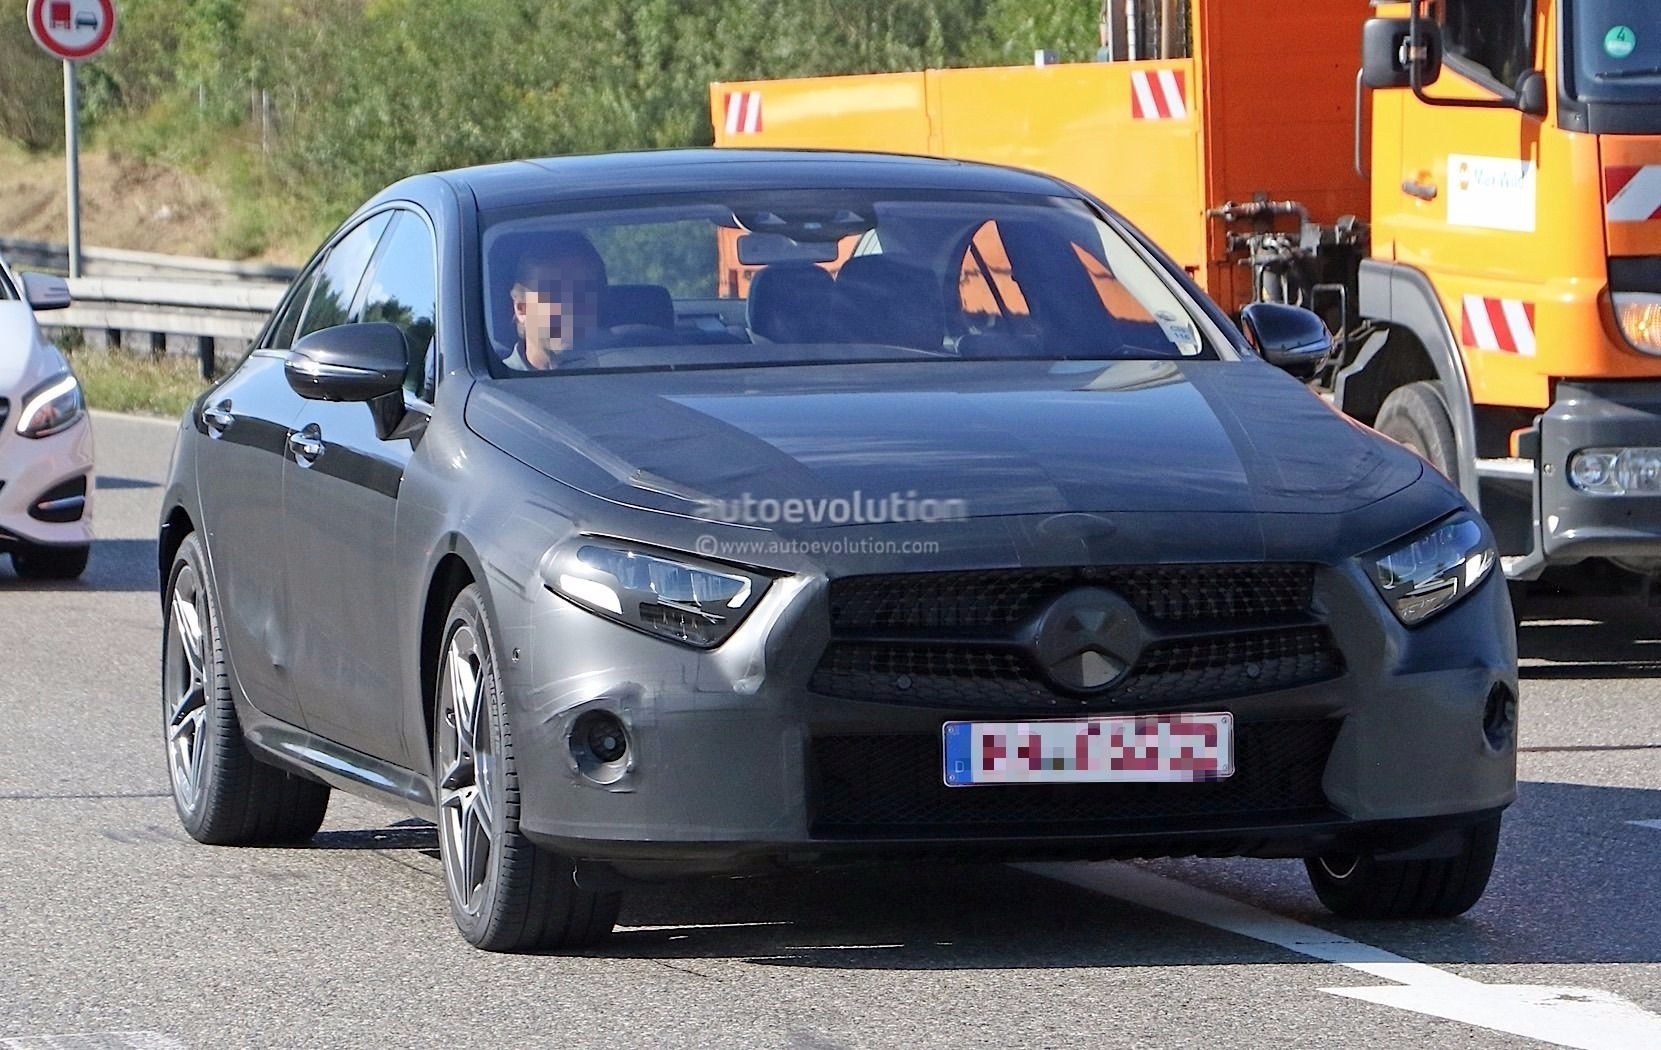 Spyshots 2018 Mercedes Benz Cls Prototype Looks Production Ready